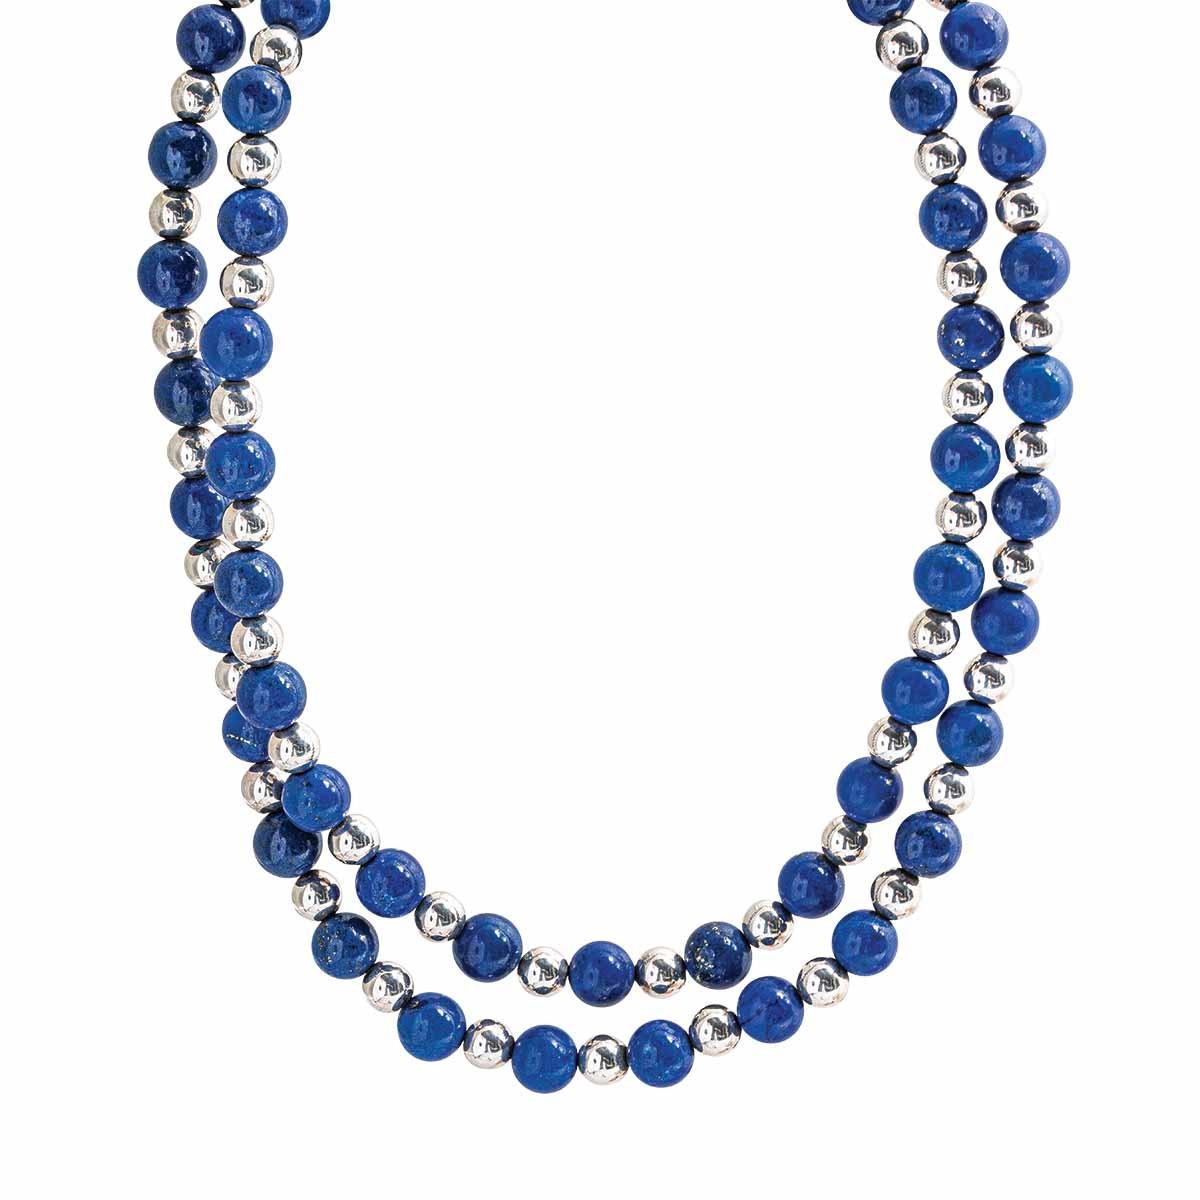 Vintage Tiffany & Co. Lapis Necklace